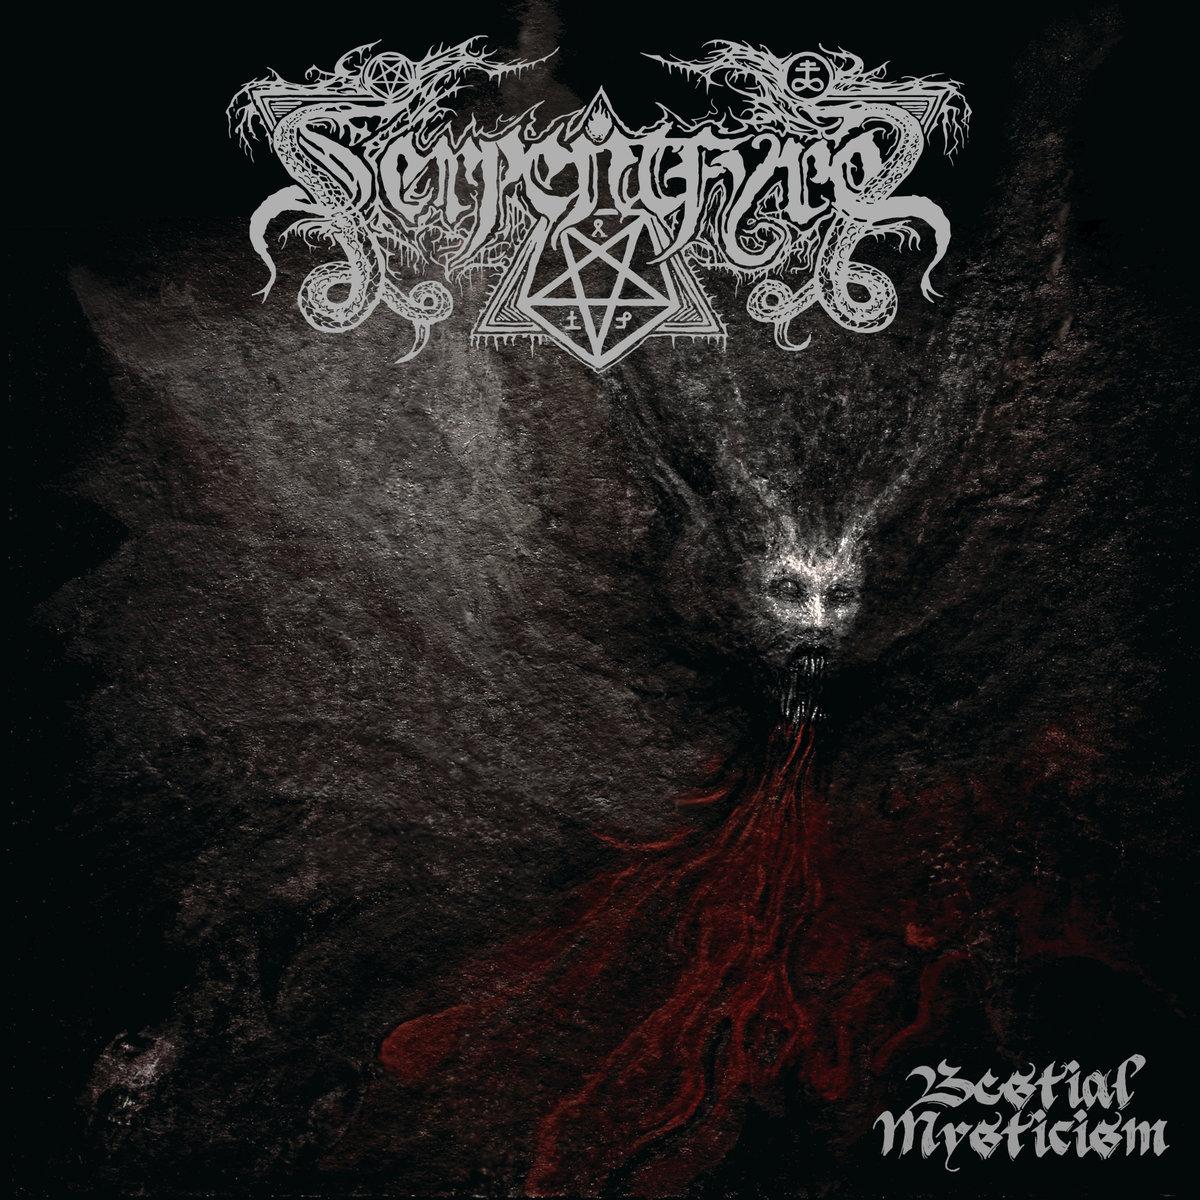 SERPENTFYRE - Bestial Mysticism